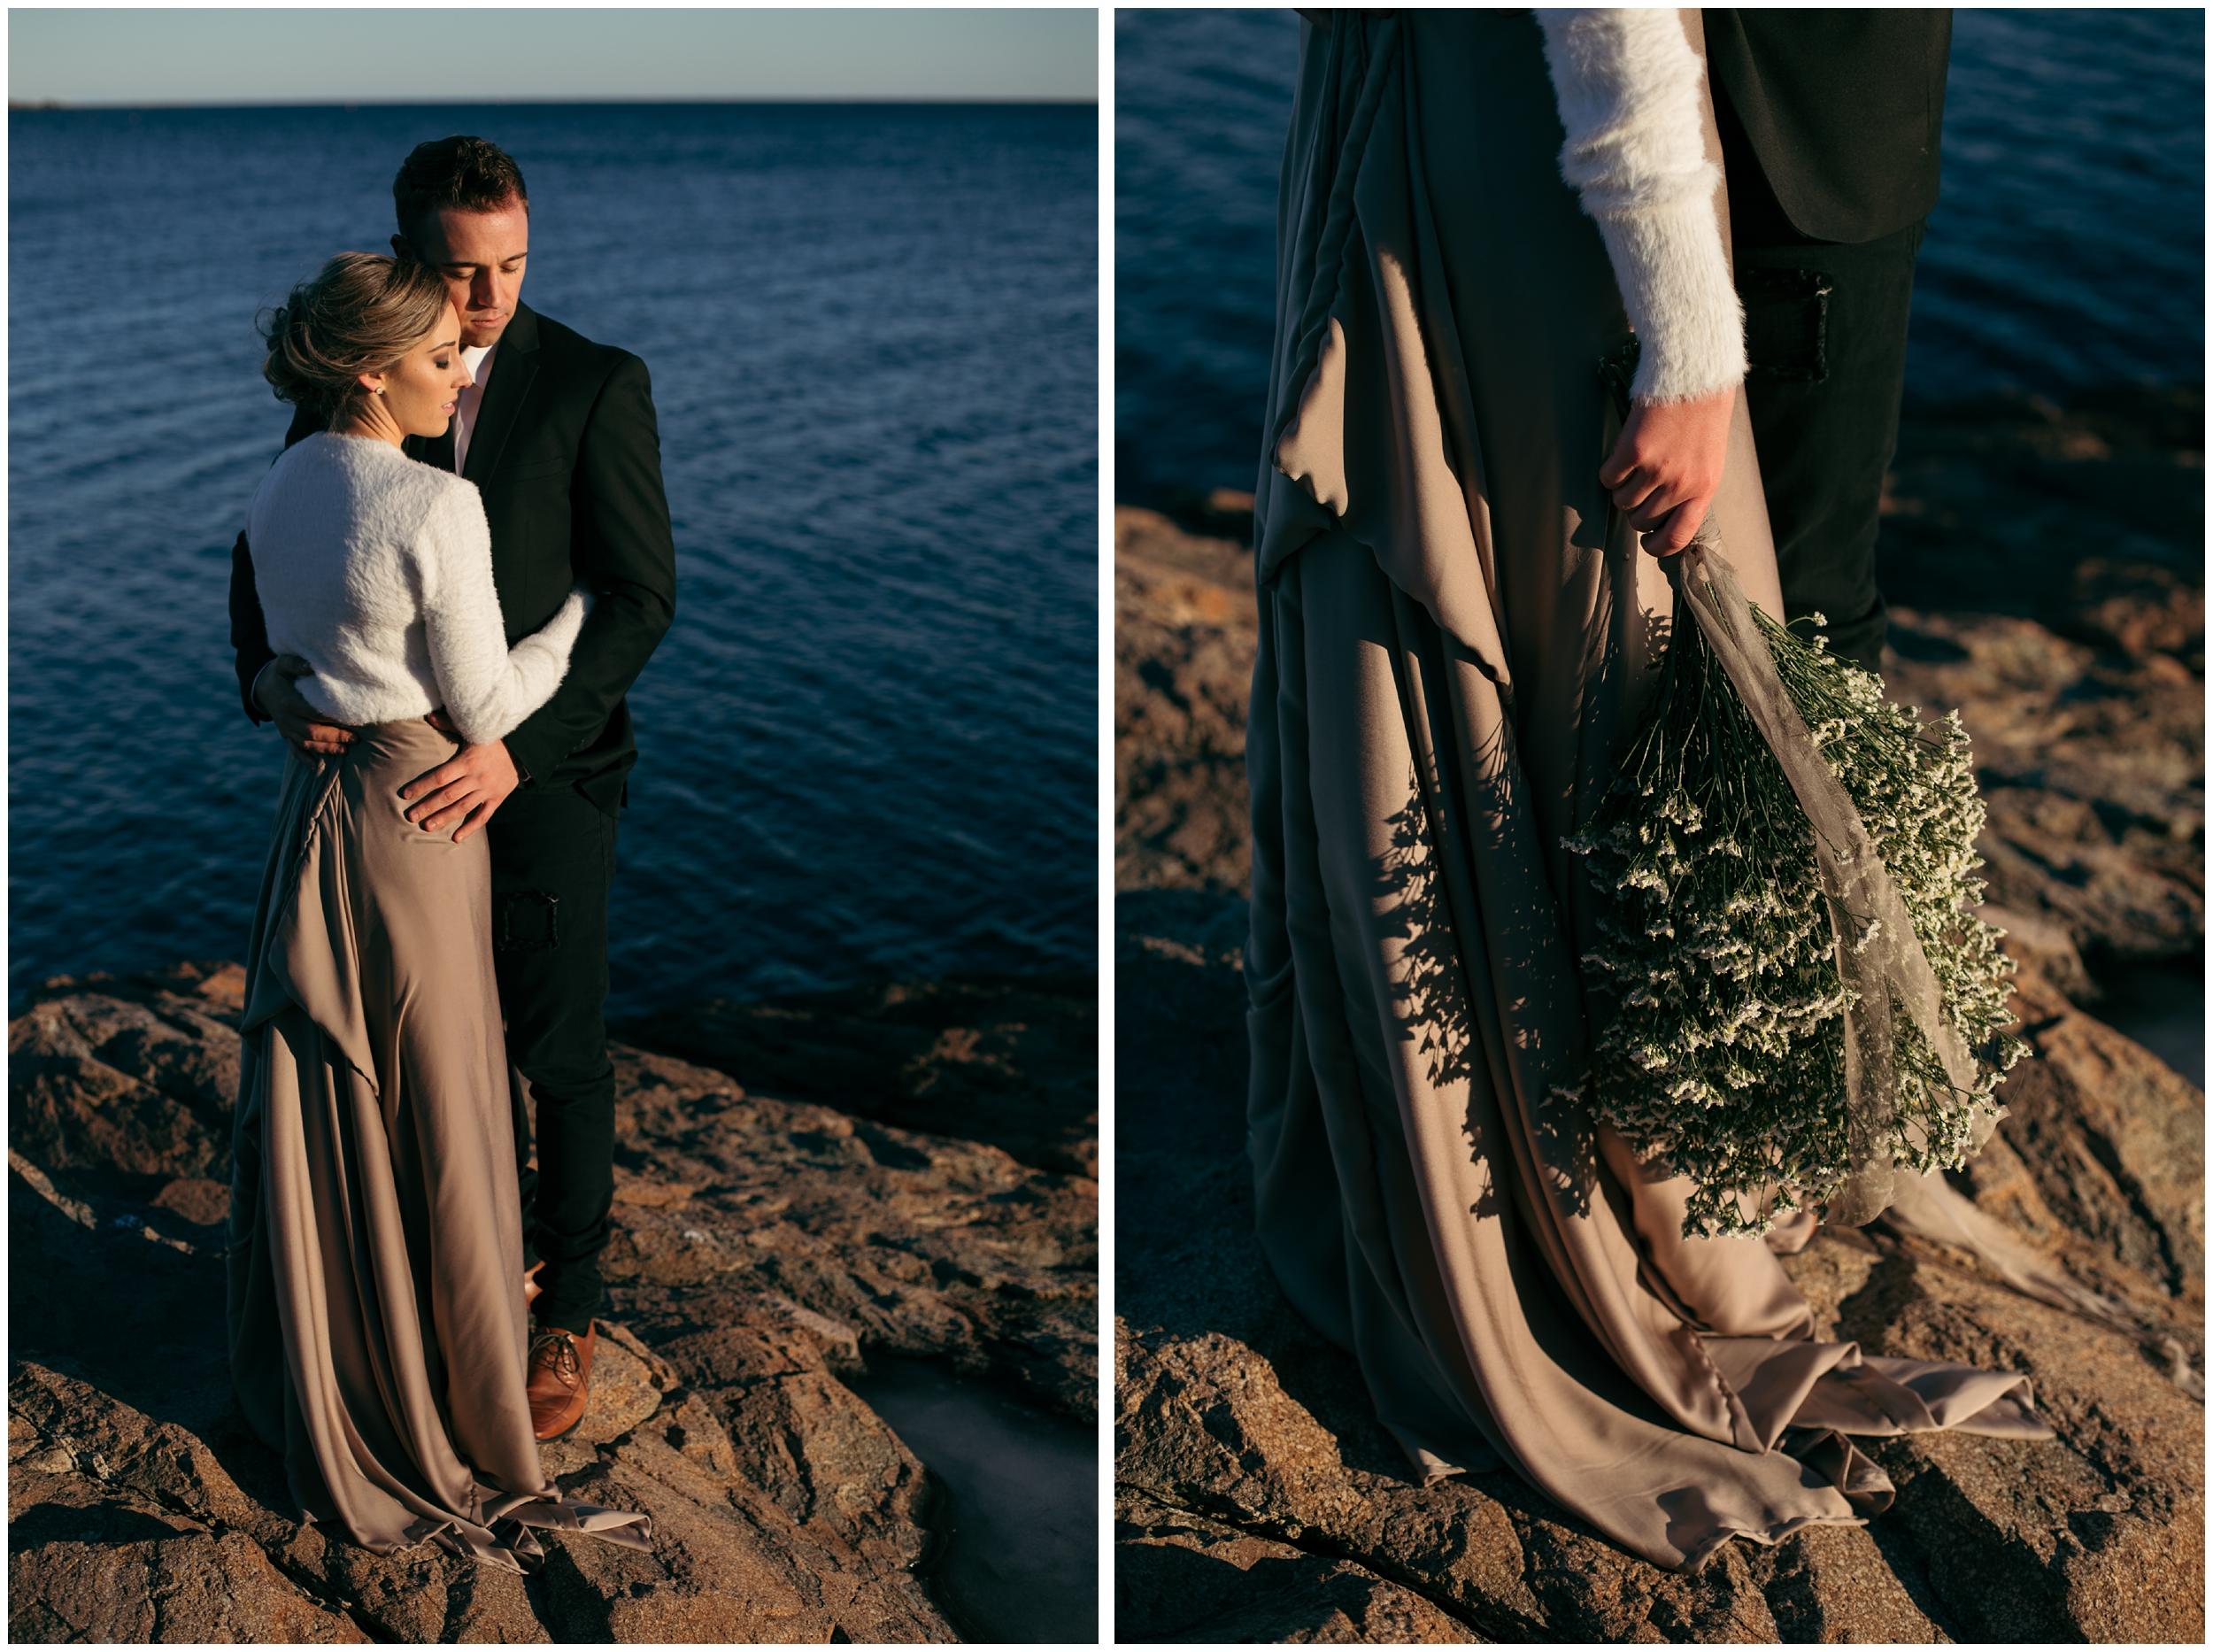 Oceanside elopement in Nahant, MA